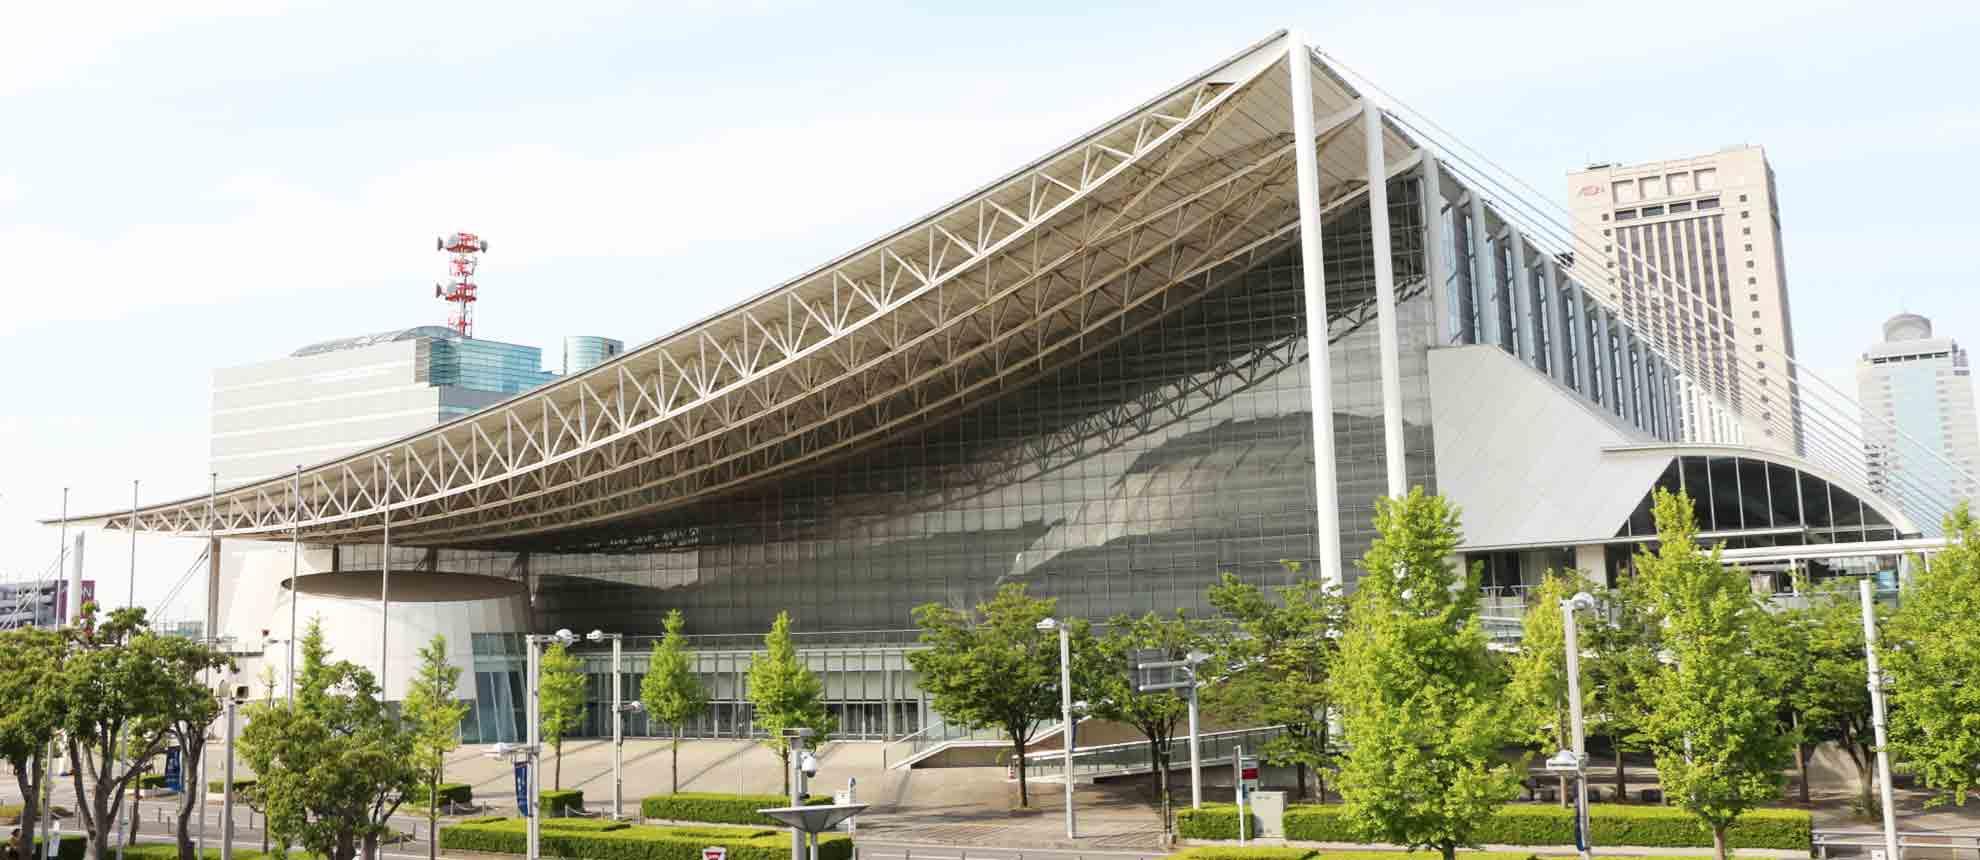 Estádio Nacional - Kengo Kuma. Foto: Arne Müseler/Wikicommon